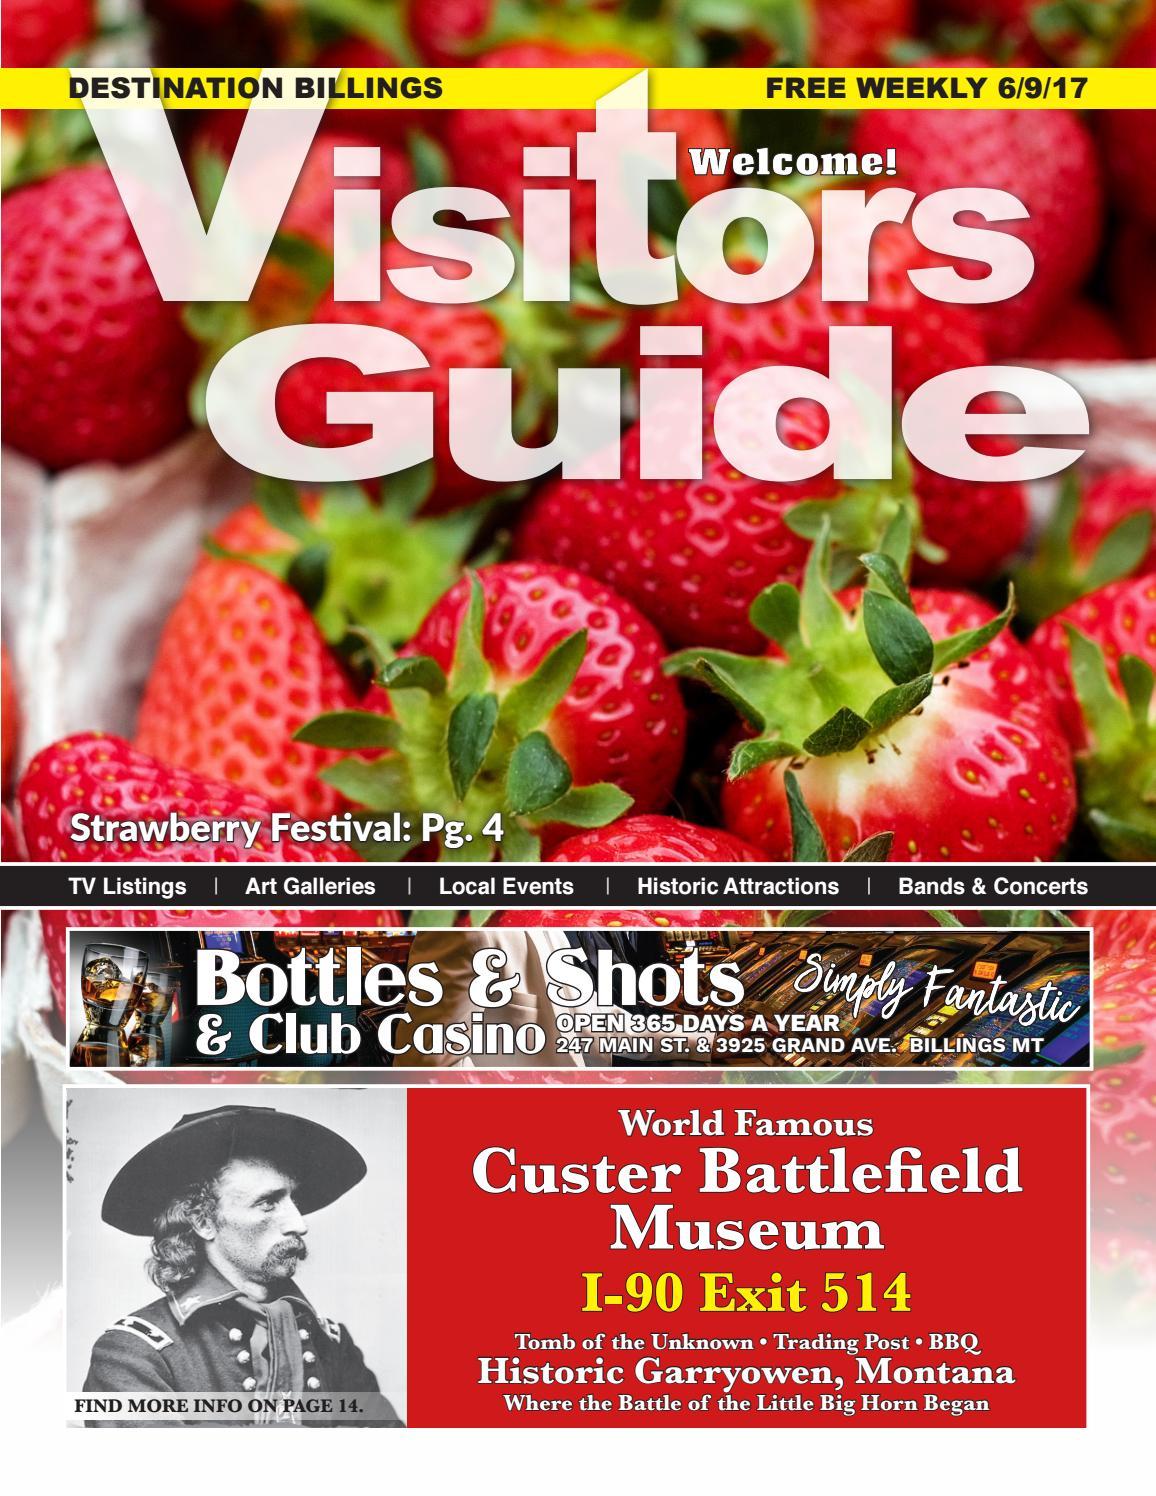 Welcome! Visitors Guide 17-6-9 by Welcome! Visitors Guide